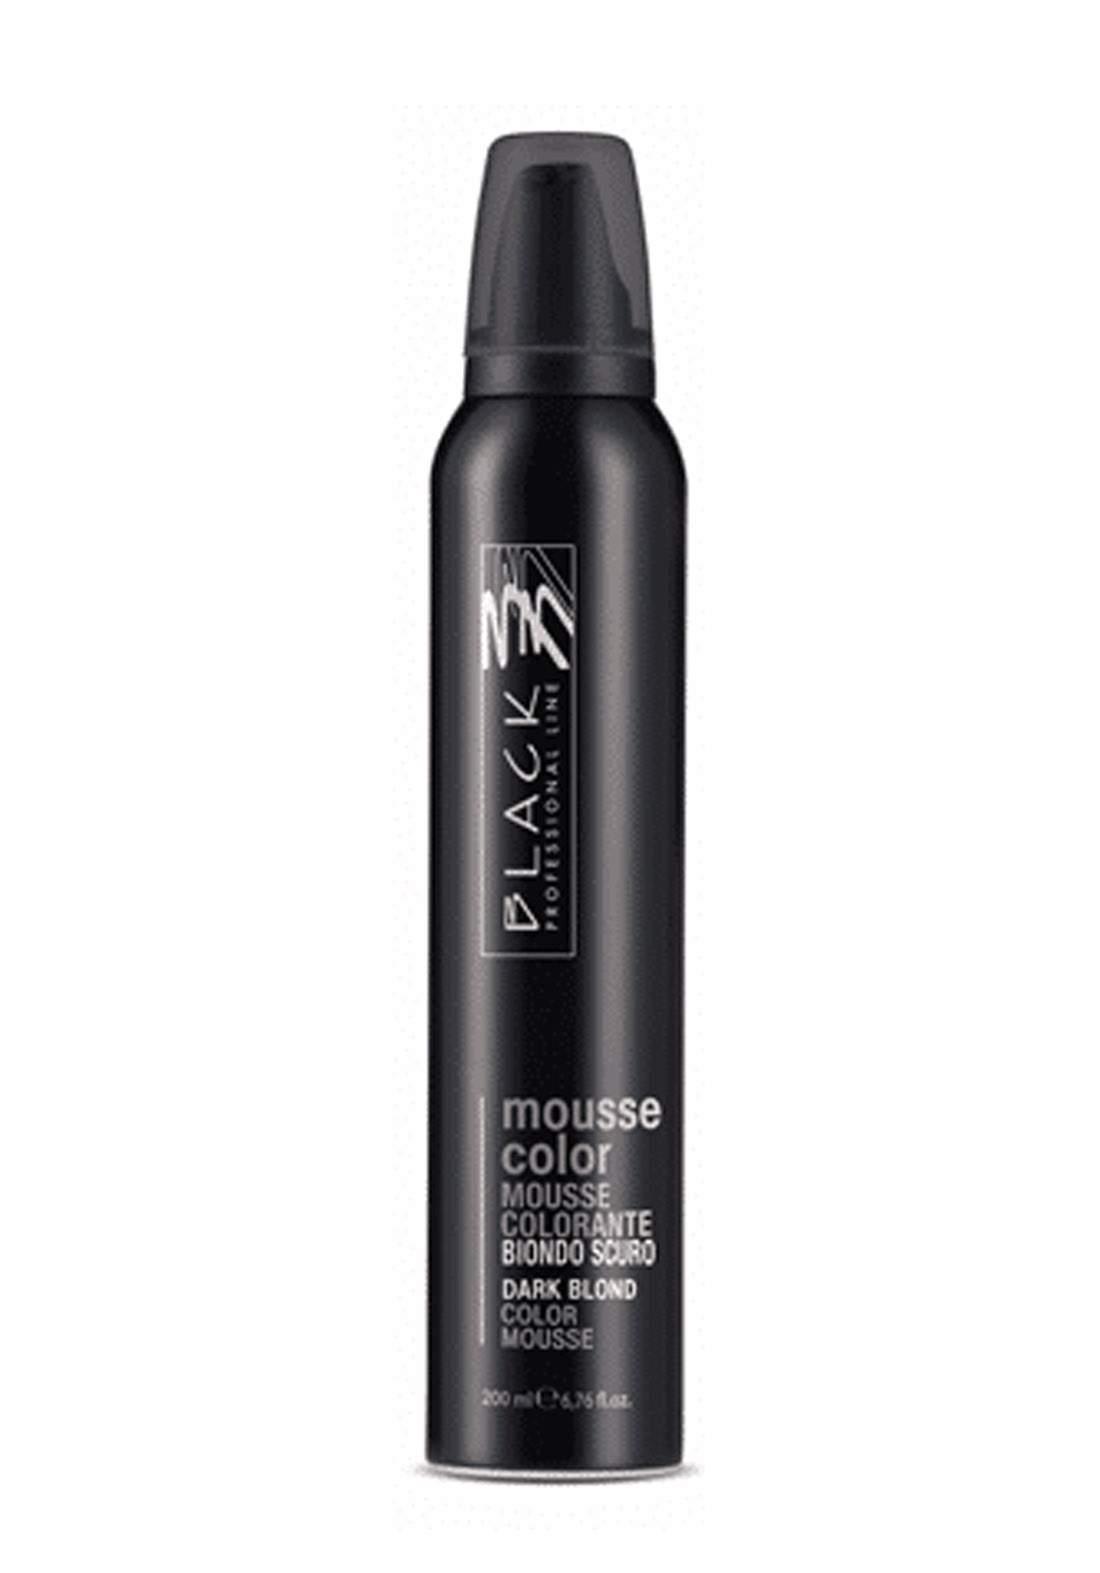 Black Mousse Color Protective Coloring 200ml Dark Blonde  موس حماية اللون